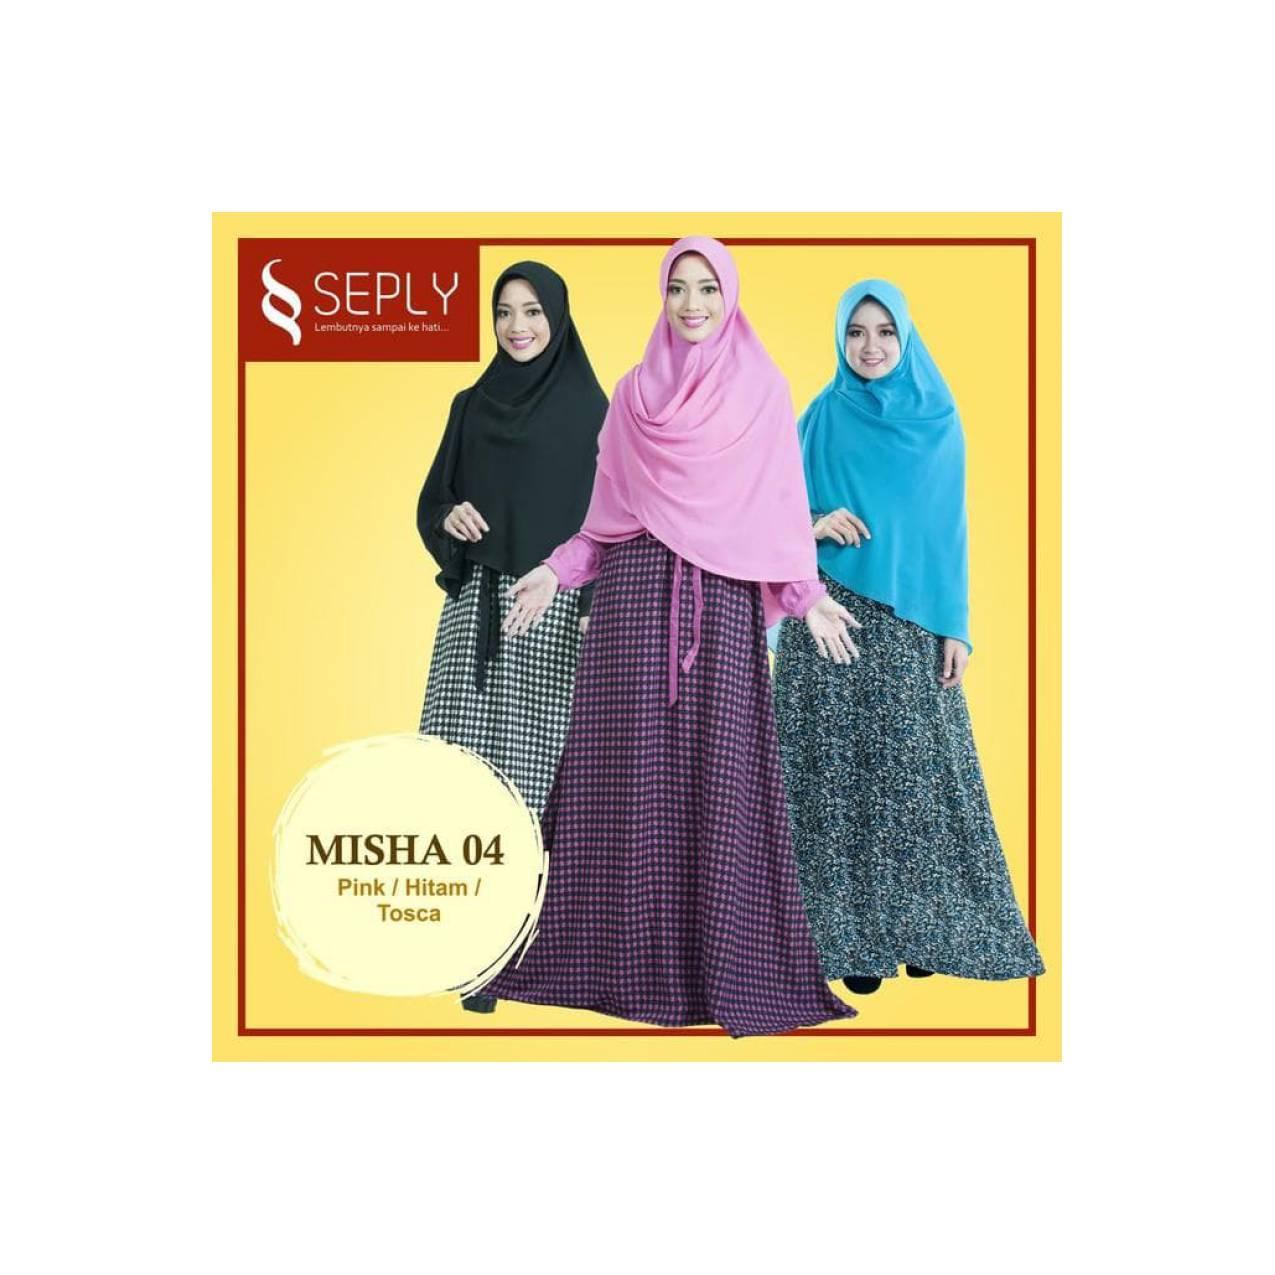 Gamis Plus Jilbab Satu Set Ukuran XL SEPLY Misha-04